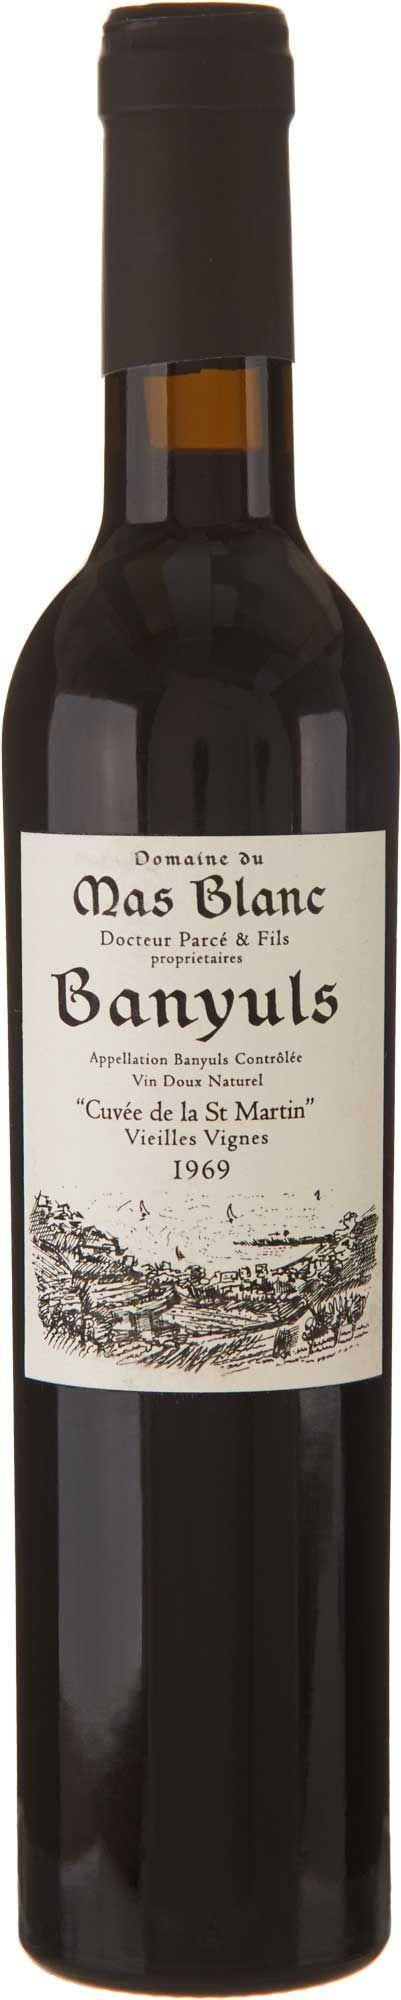 Domaine du Mas Blanc Banyuls Cuvee St. Martin 1969